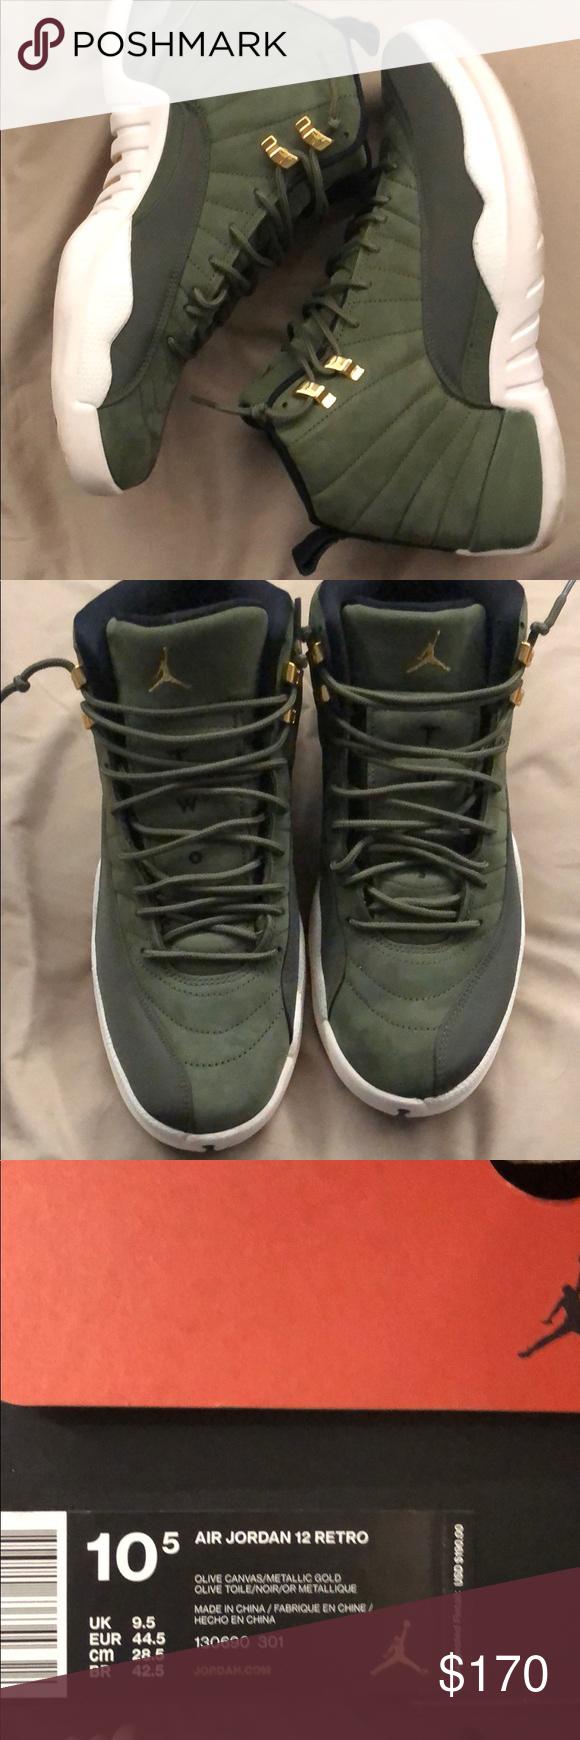 new styles aaa5d efa00 Jordans 12 Olive green Air Jordan 12s Olive green suede ...